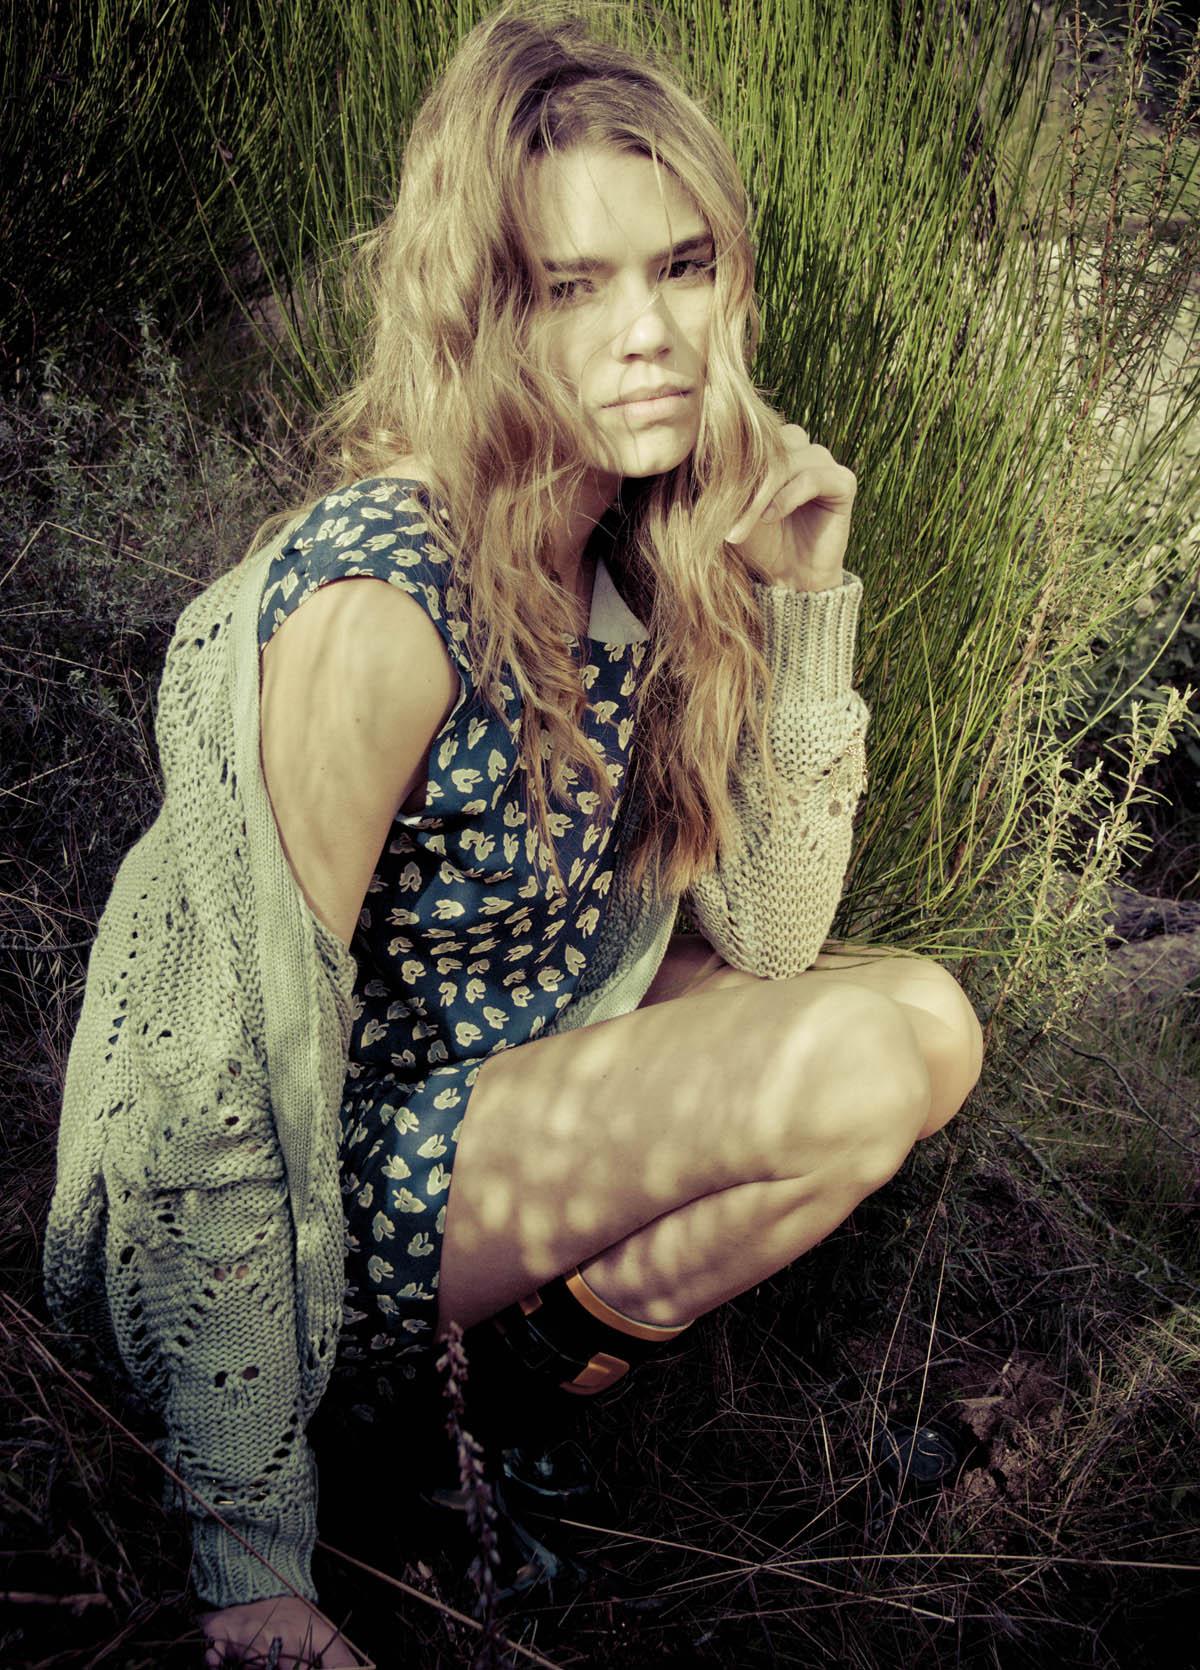 Moda española de primavera/verano inspirada en la naturaleza